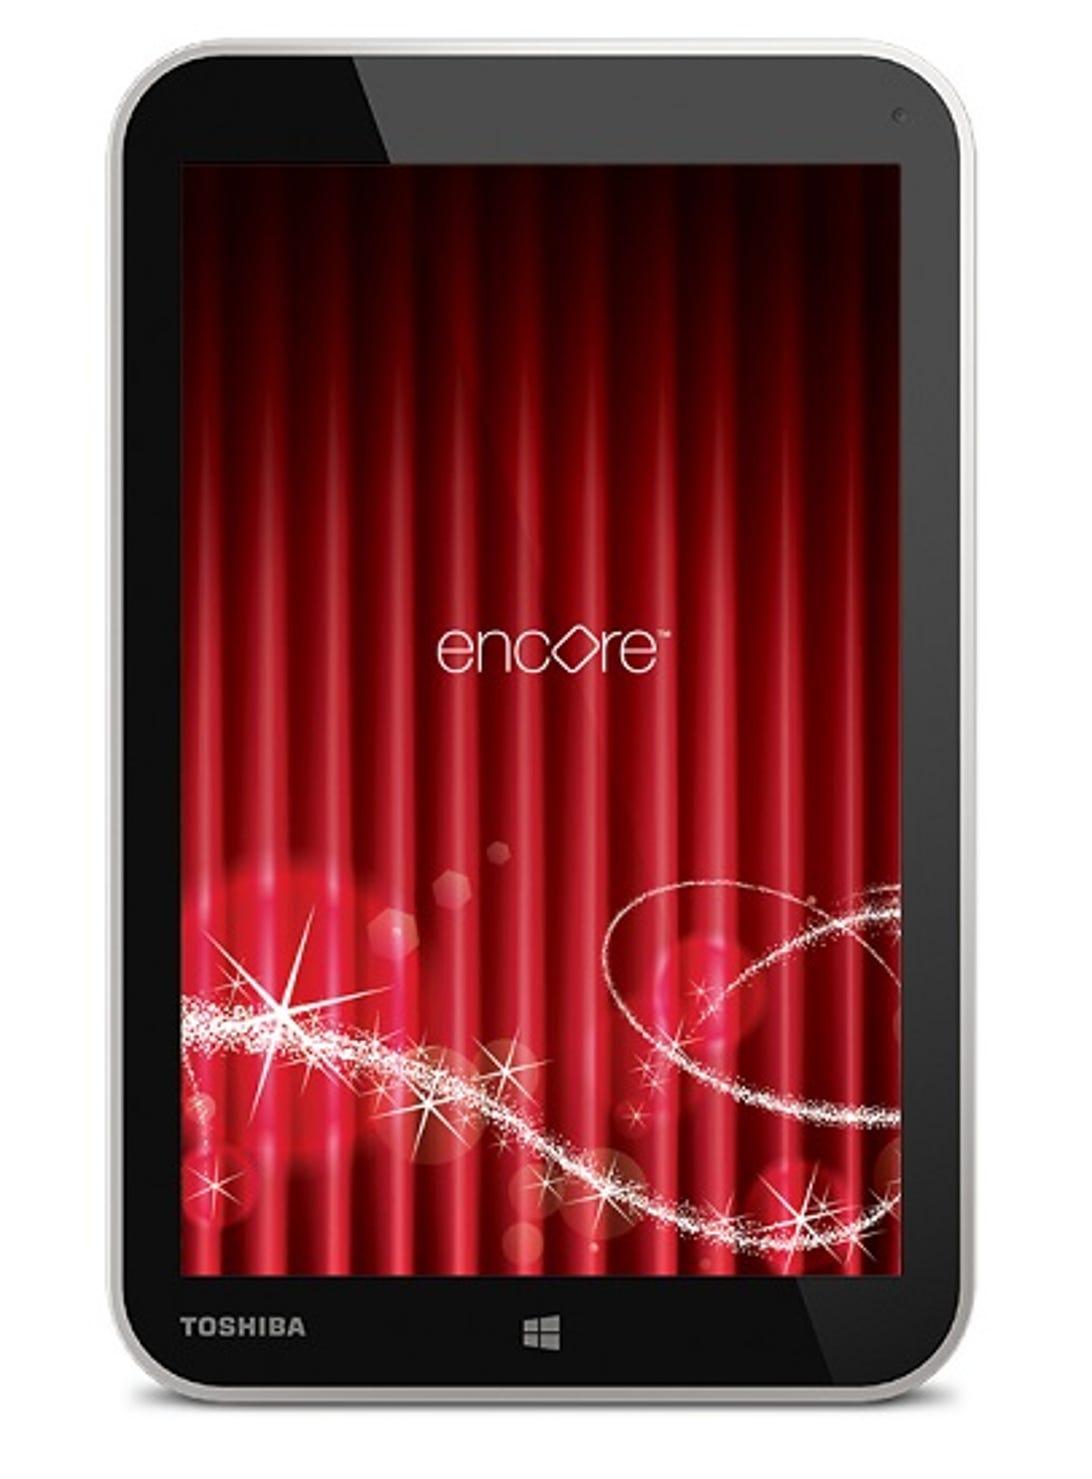 toshiba-encore-android-tablet.jpg